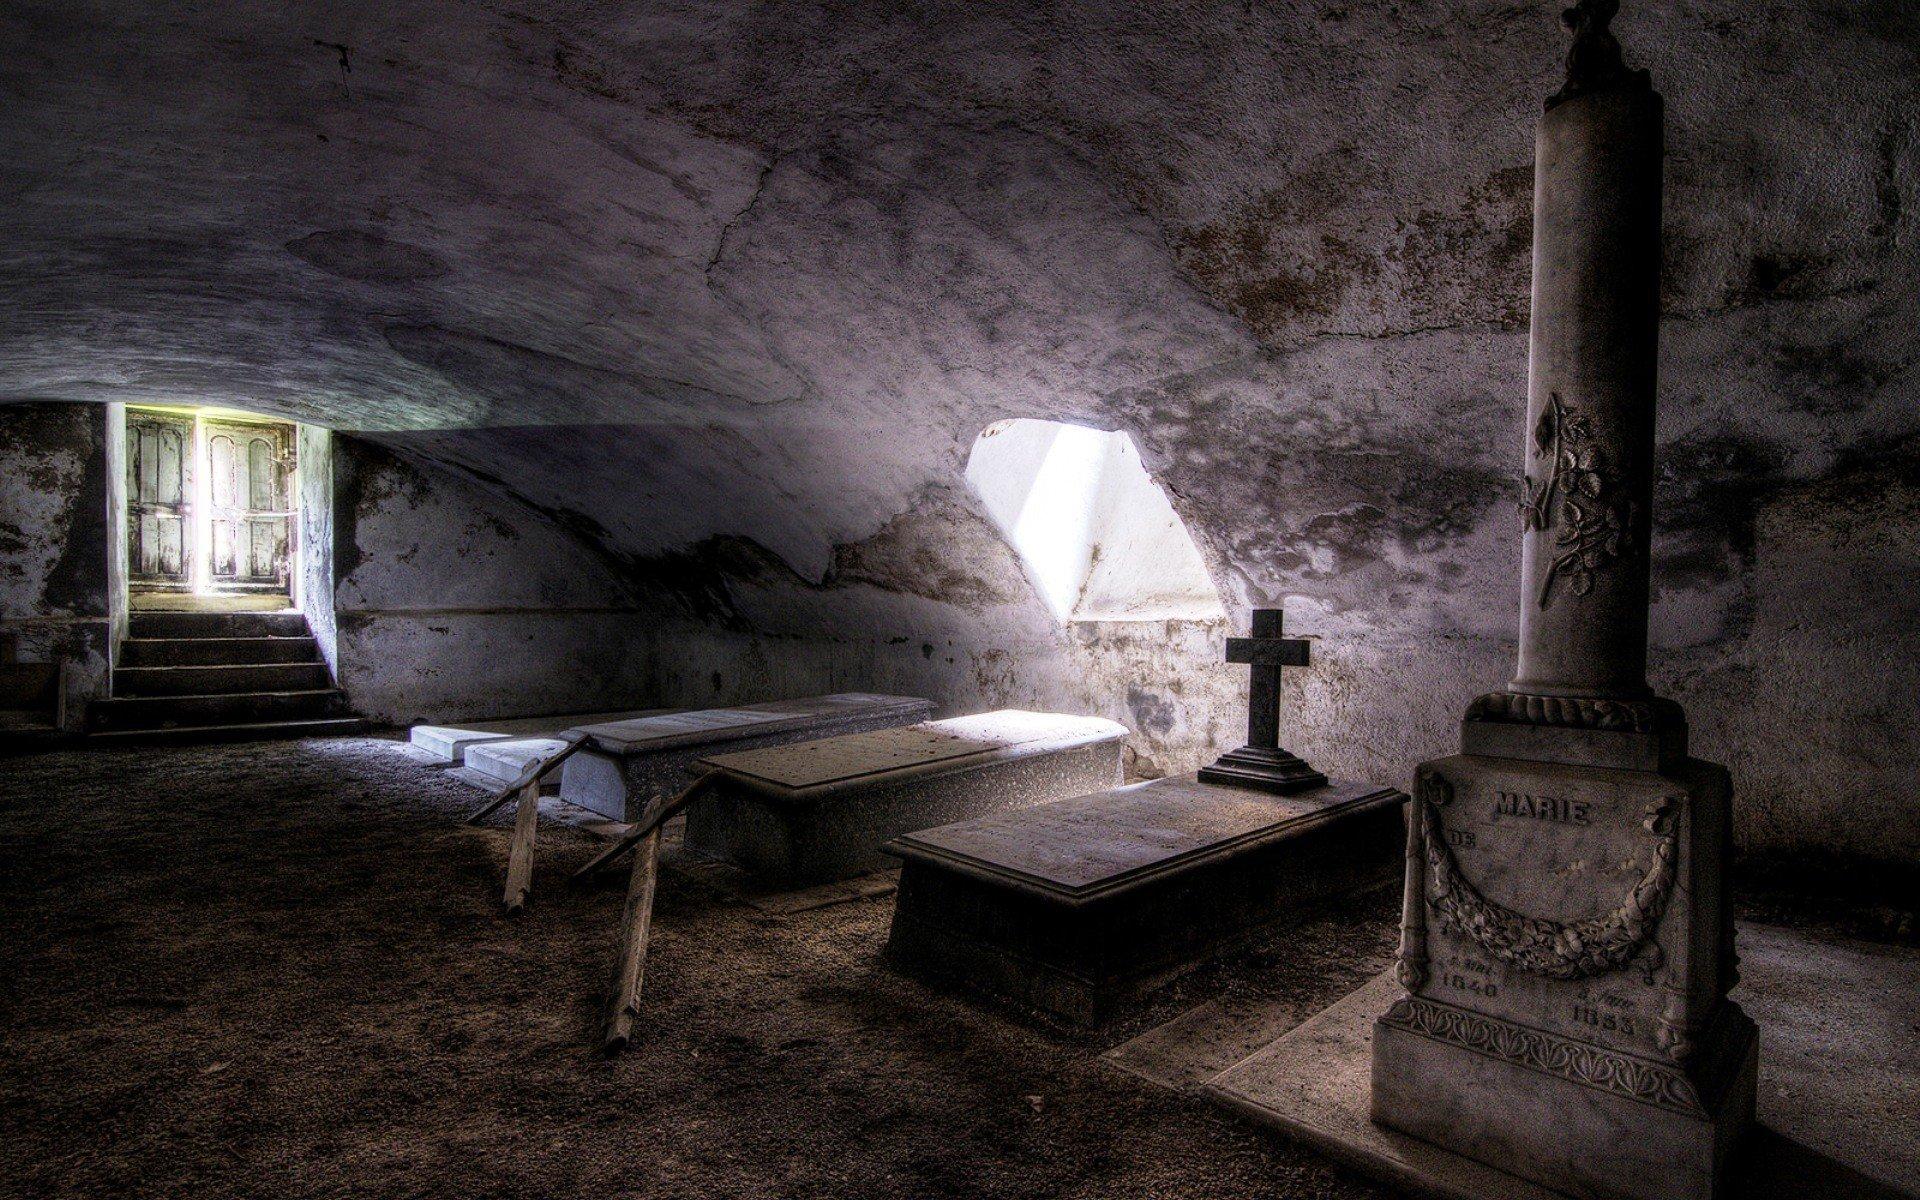 Interior Sunlight Tomb Grave Cross Abandoned Stones